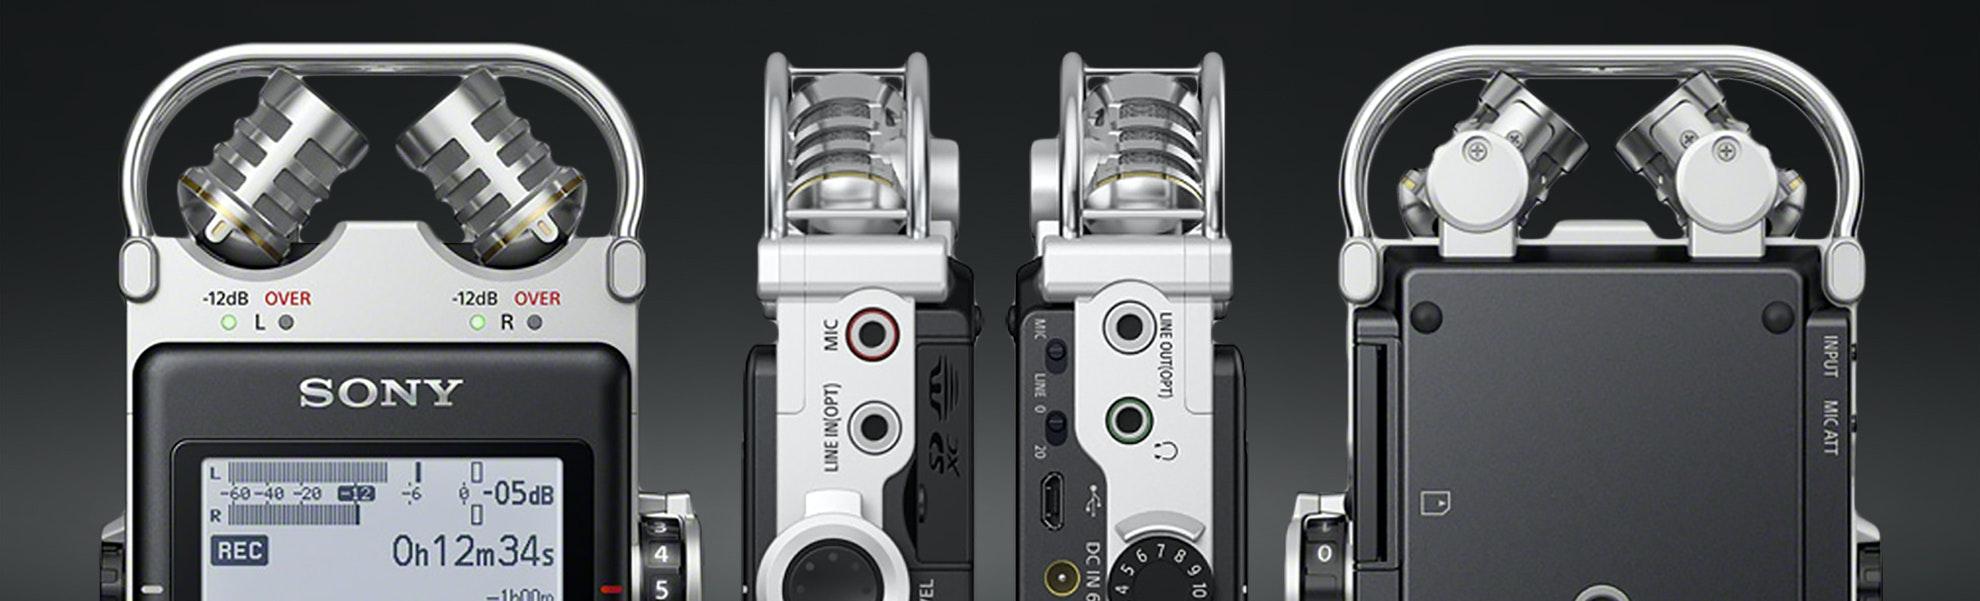 Sony PCM-D100 Portable Recorder